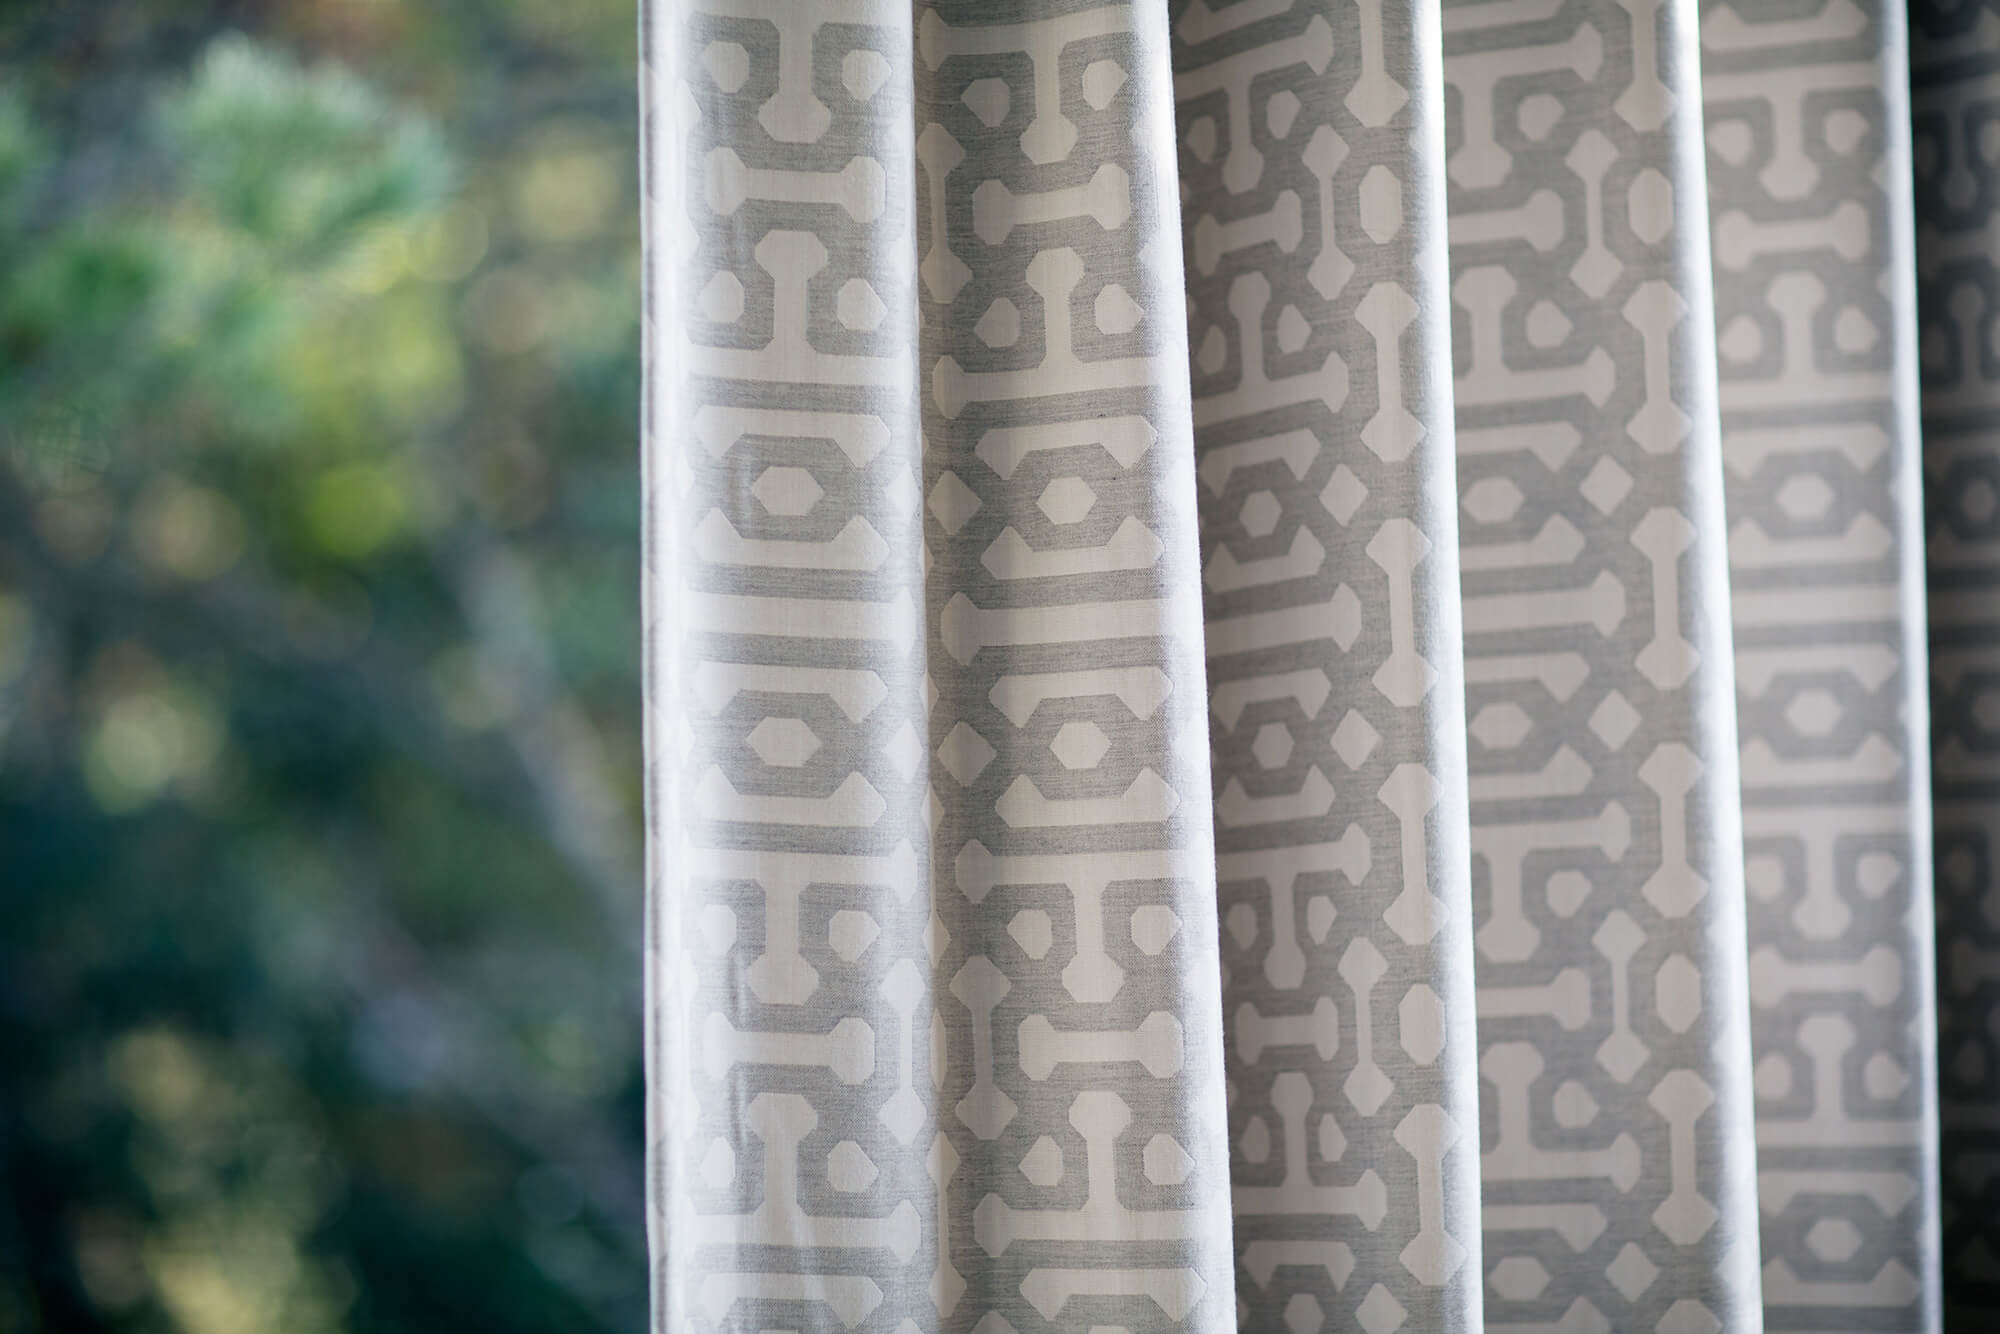 Cortinas para exteriores fabricadas utilizando tela de tapicería Fretwork Pewter de Sunbrella